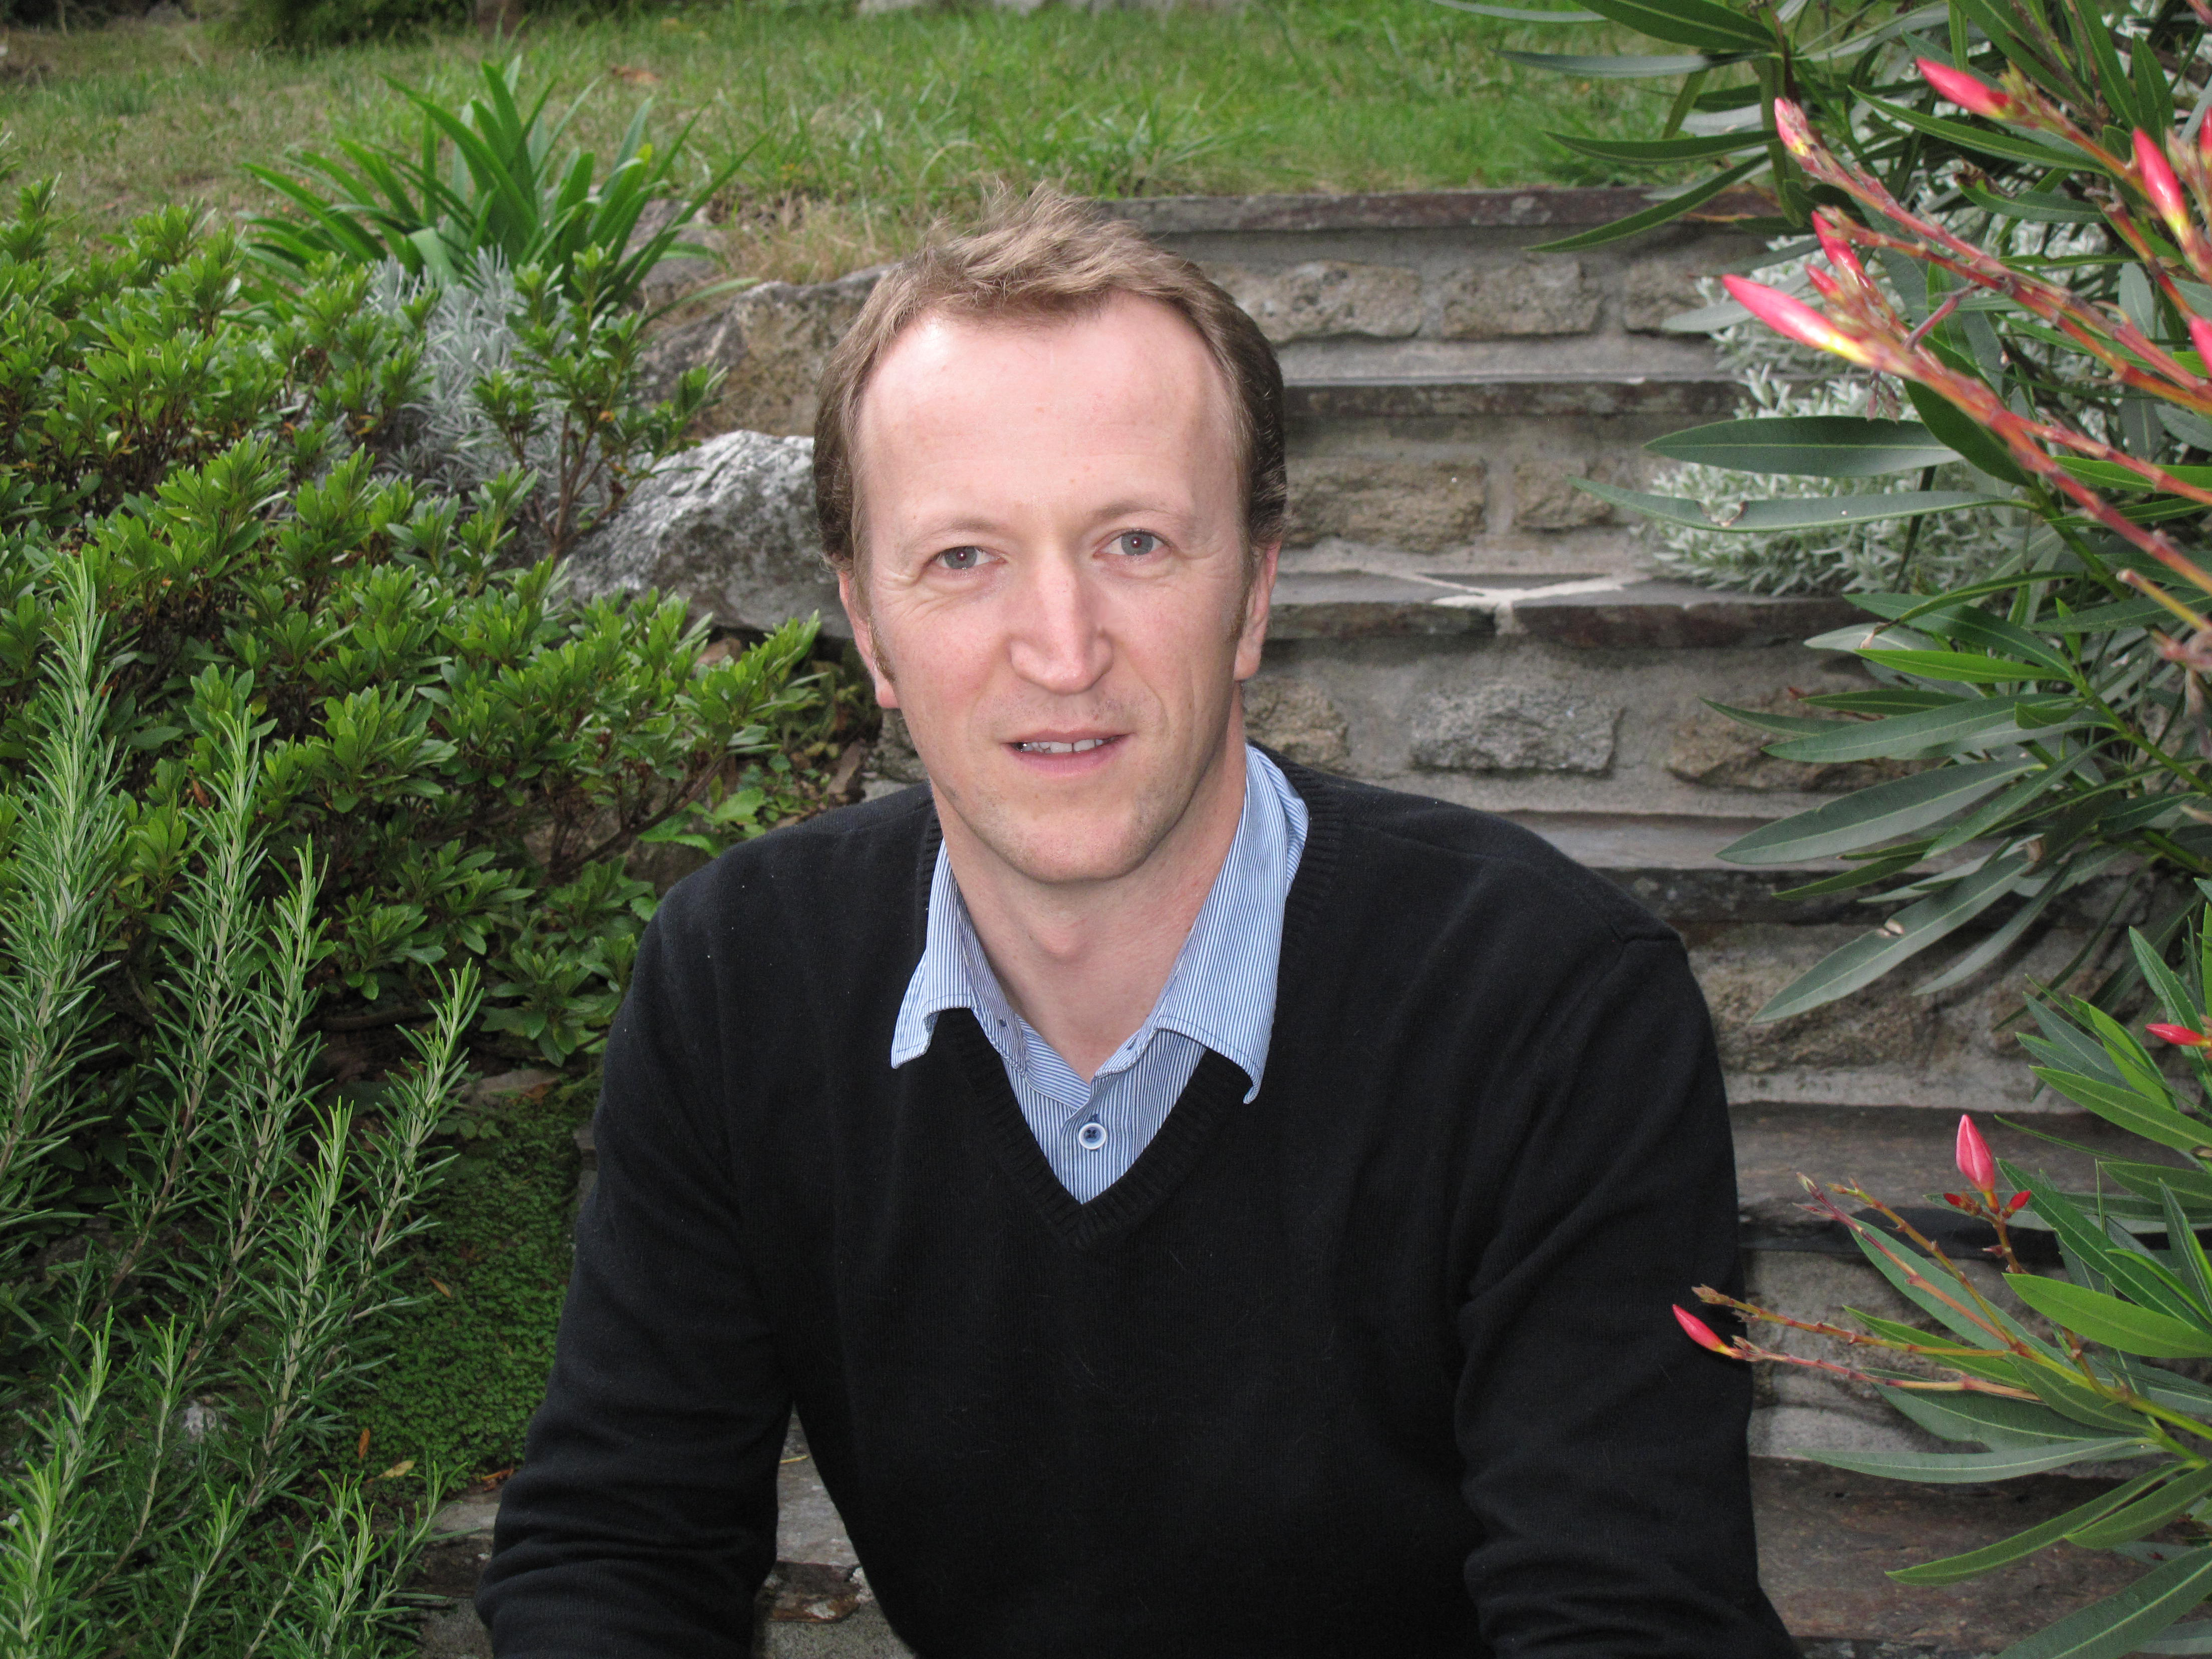 Mikael Bodlore-Penlaez